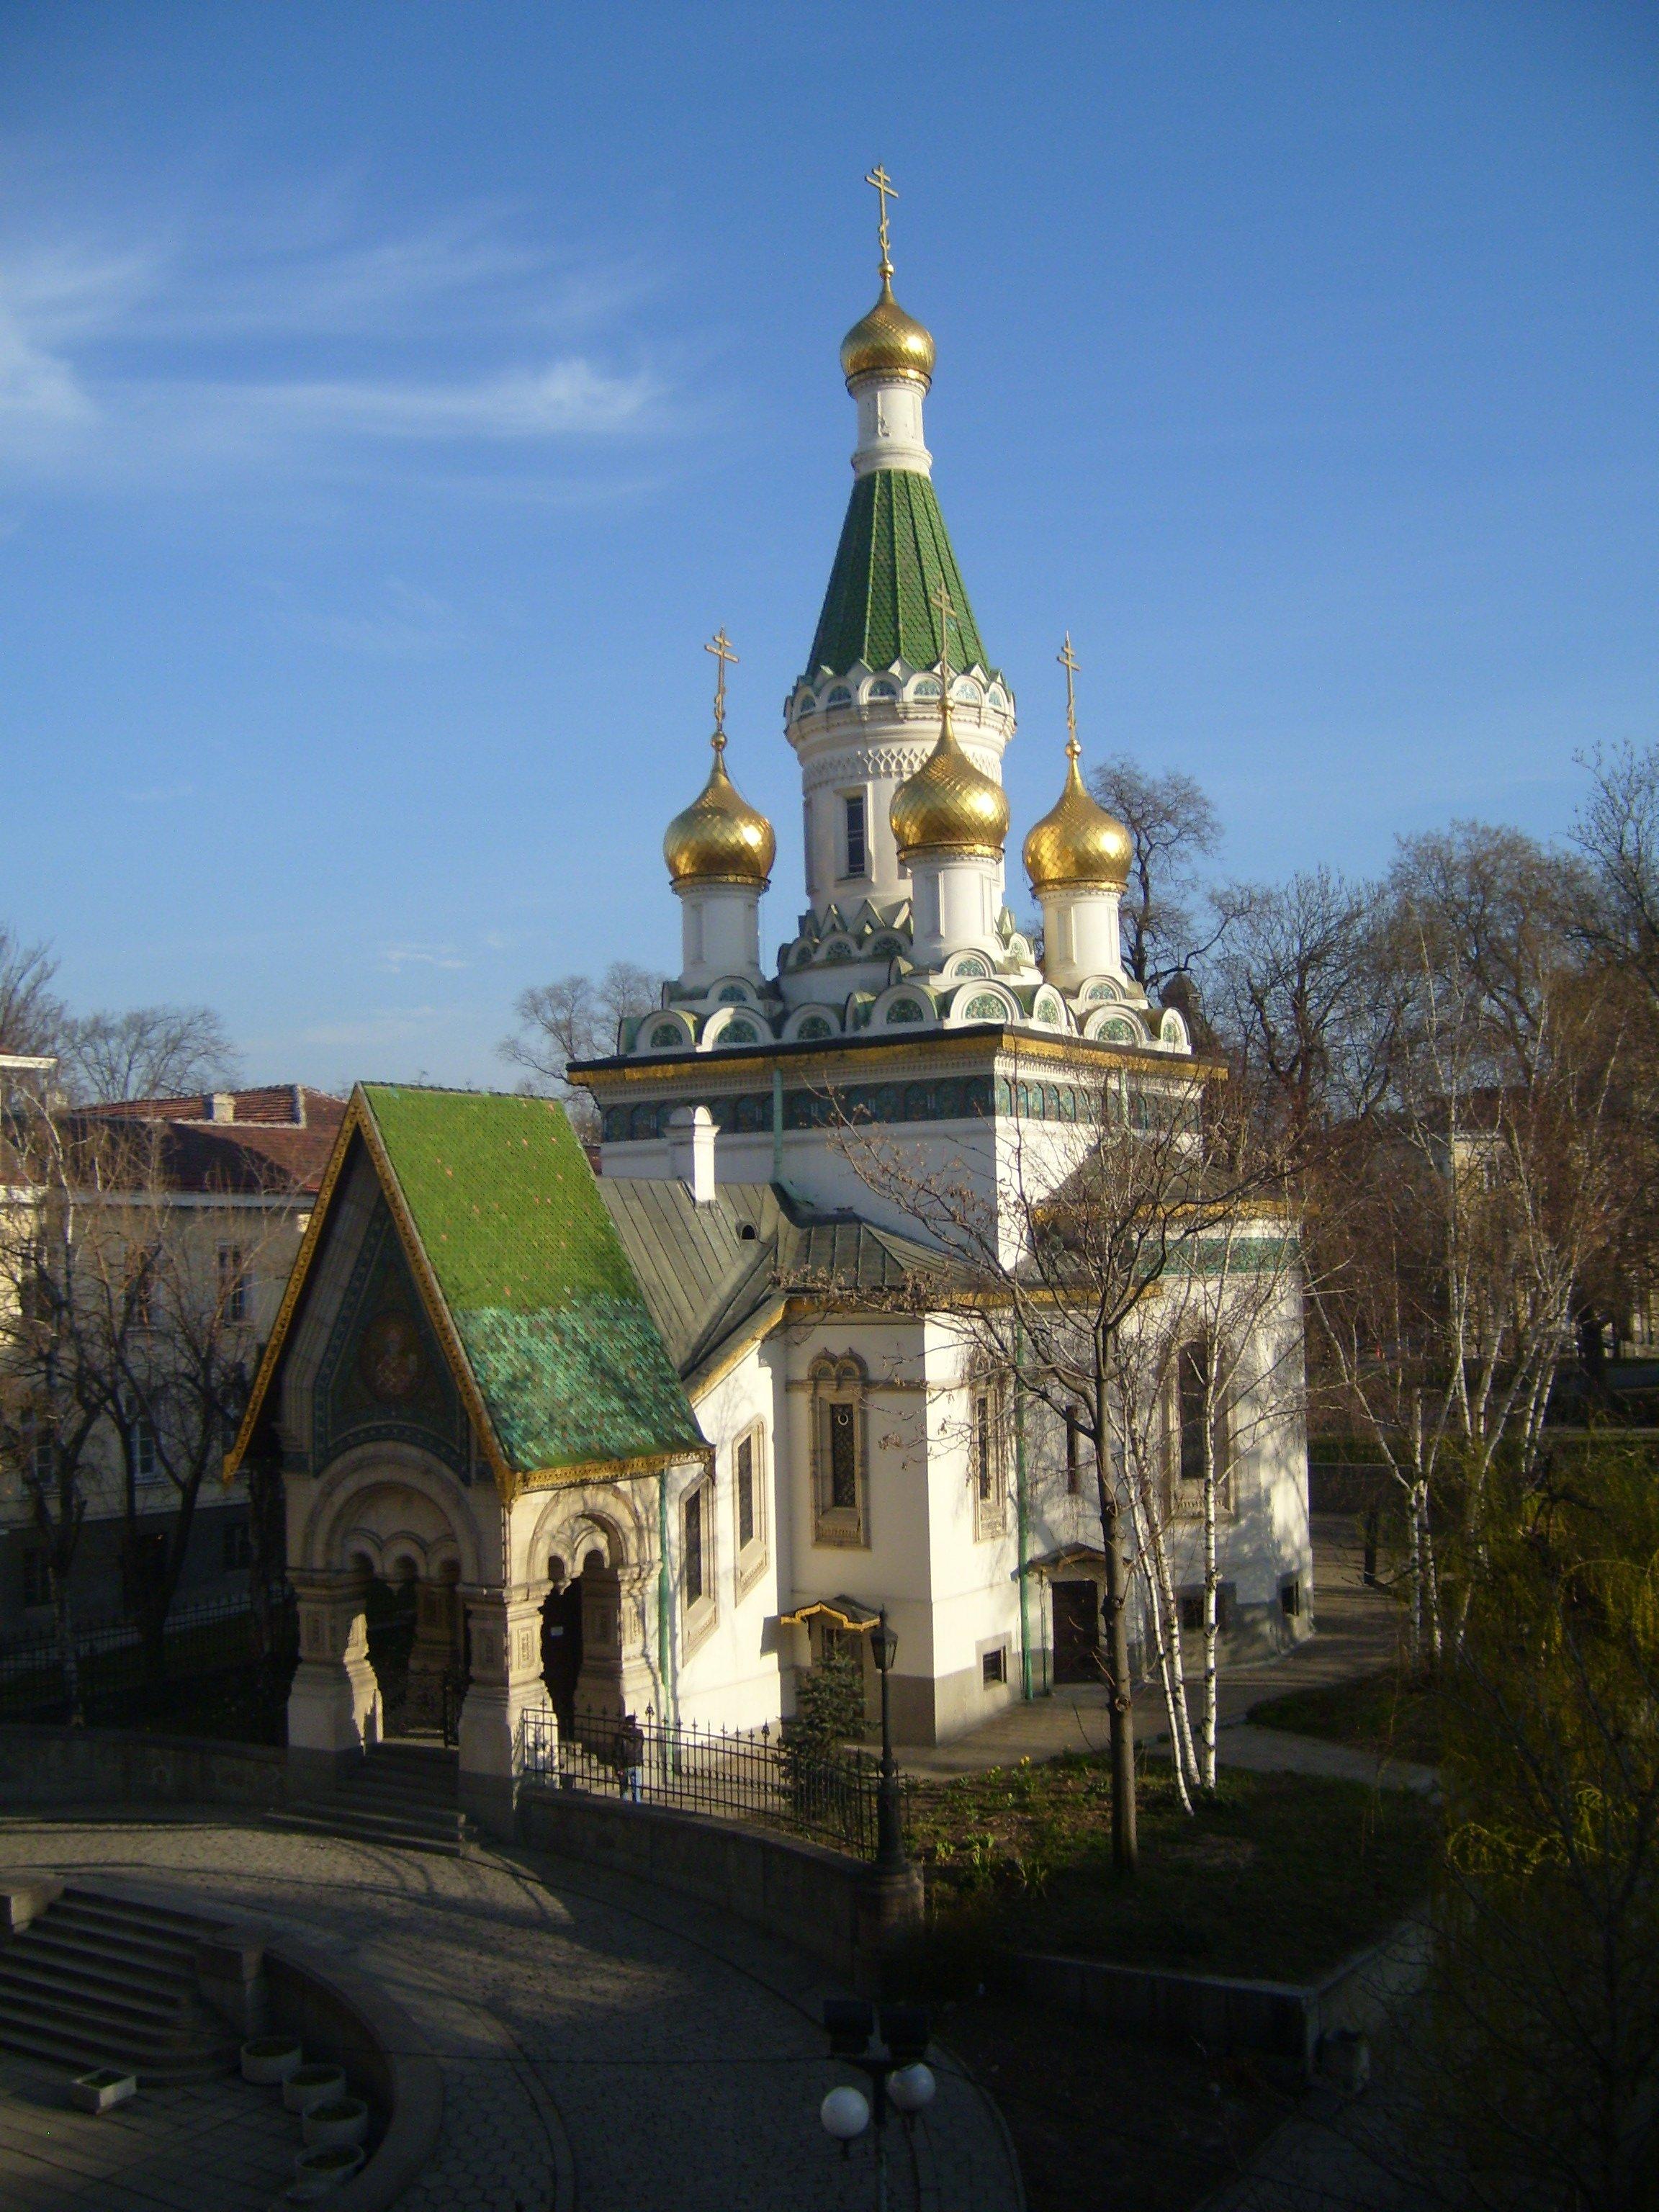 Sofia Bulgaria  city photos gallery : The Russian church St. Nicholas the Miracle Maker in Sofia, Bulgaria